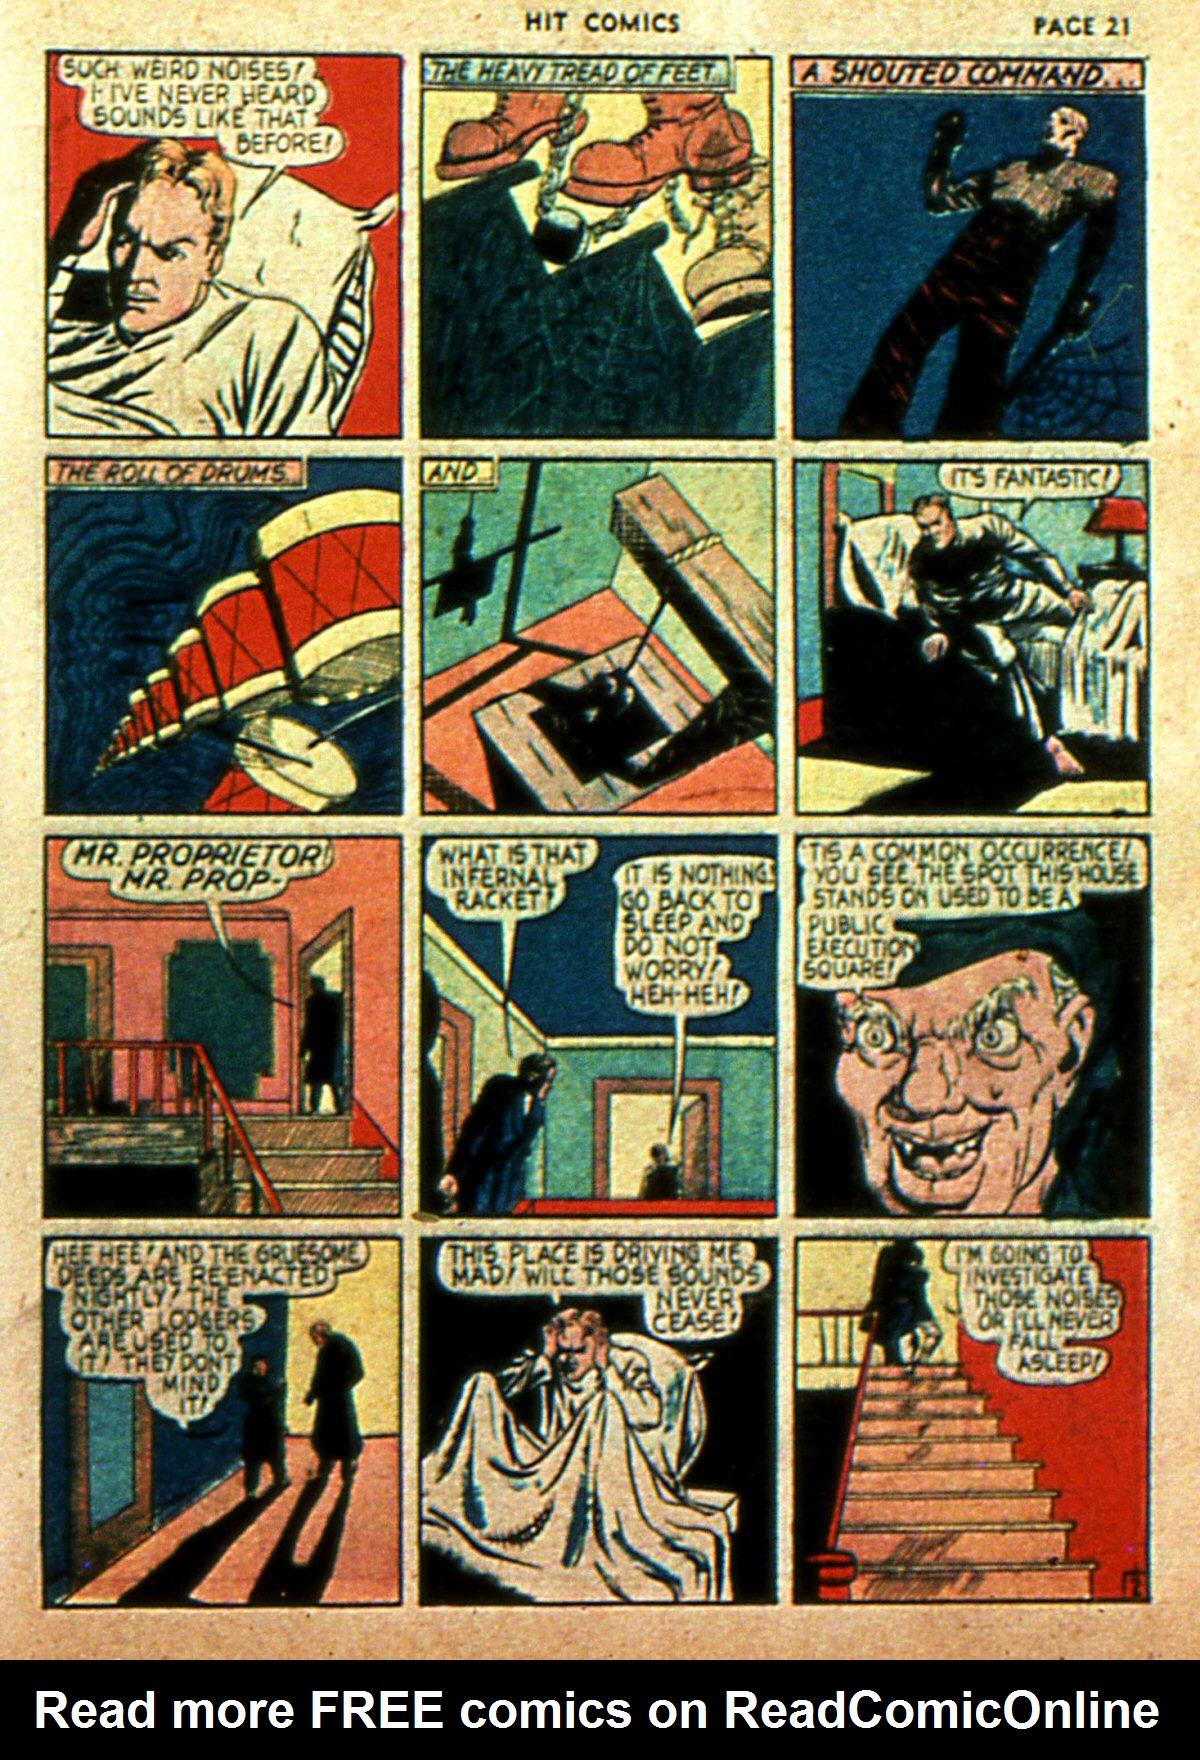 Read online Hit Comics comic -  Issue #2 - 23